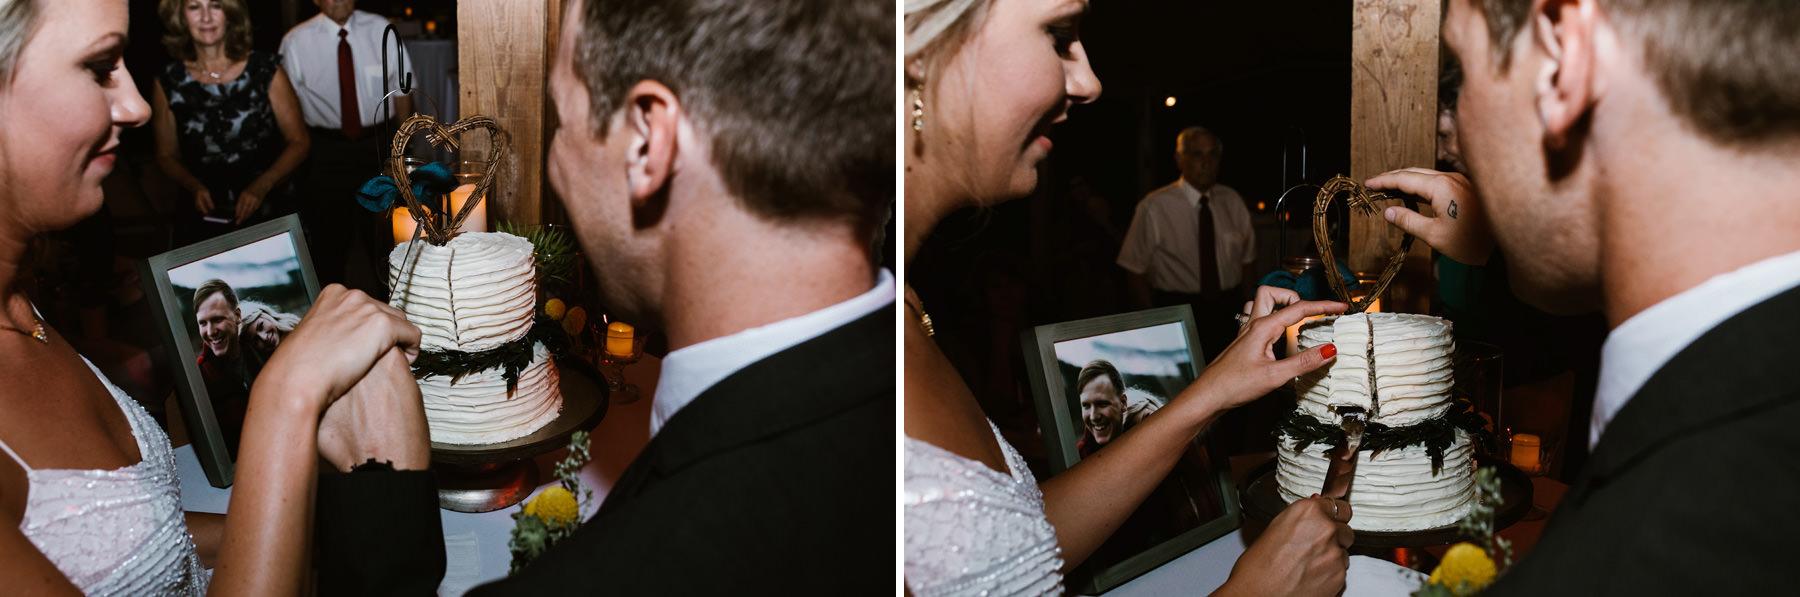 Alldredge Orchard Kansas City_Kindling Wedding Photography BLOG 78.JPG